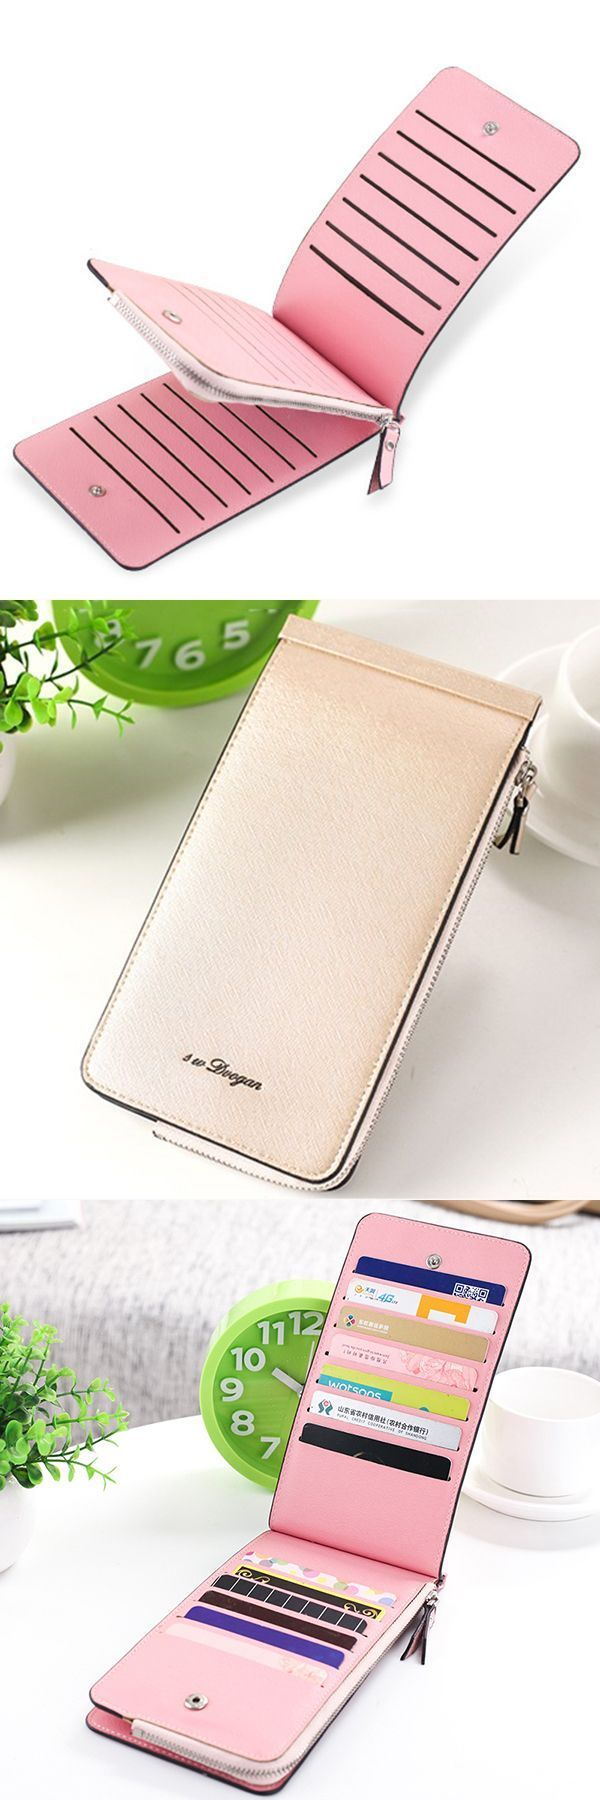 M Wallets In India Women Microfiber Leather Multi Card Slots Wallet Card Holders Phone Bag I Phone Wallets Kmart Wallets Men Card Wallet Wallet Phone Bag